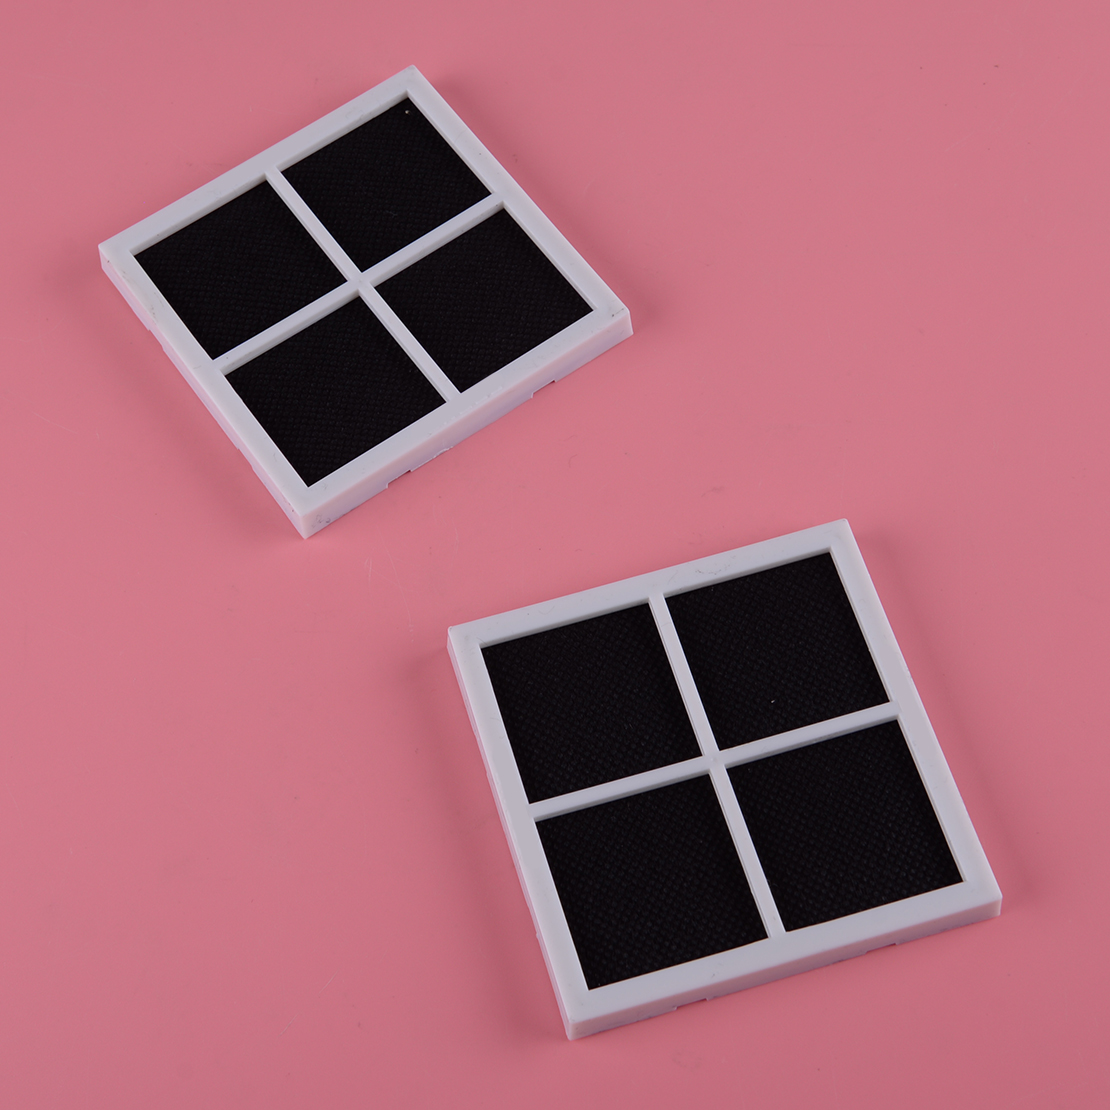 New 2pcs 8.1x8.1x0.8cm Refrigerator Air Filter Fit For Kenmore Elite 469918 LG LT120F ADQ73214402 ADQ73214403